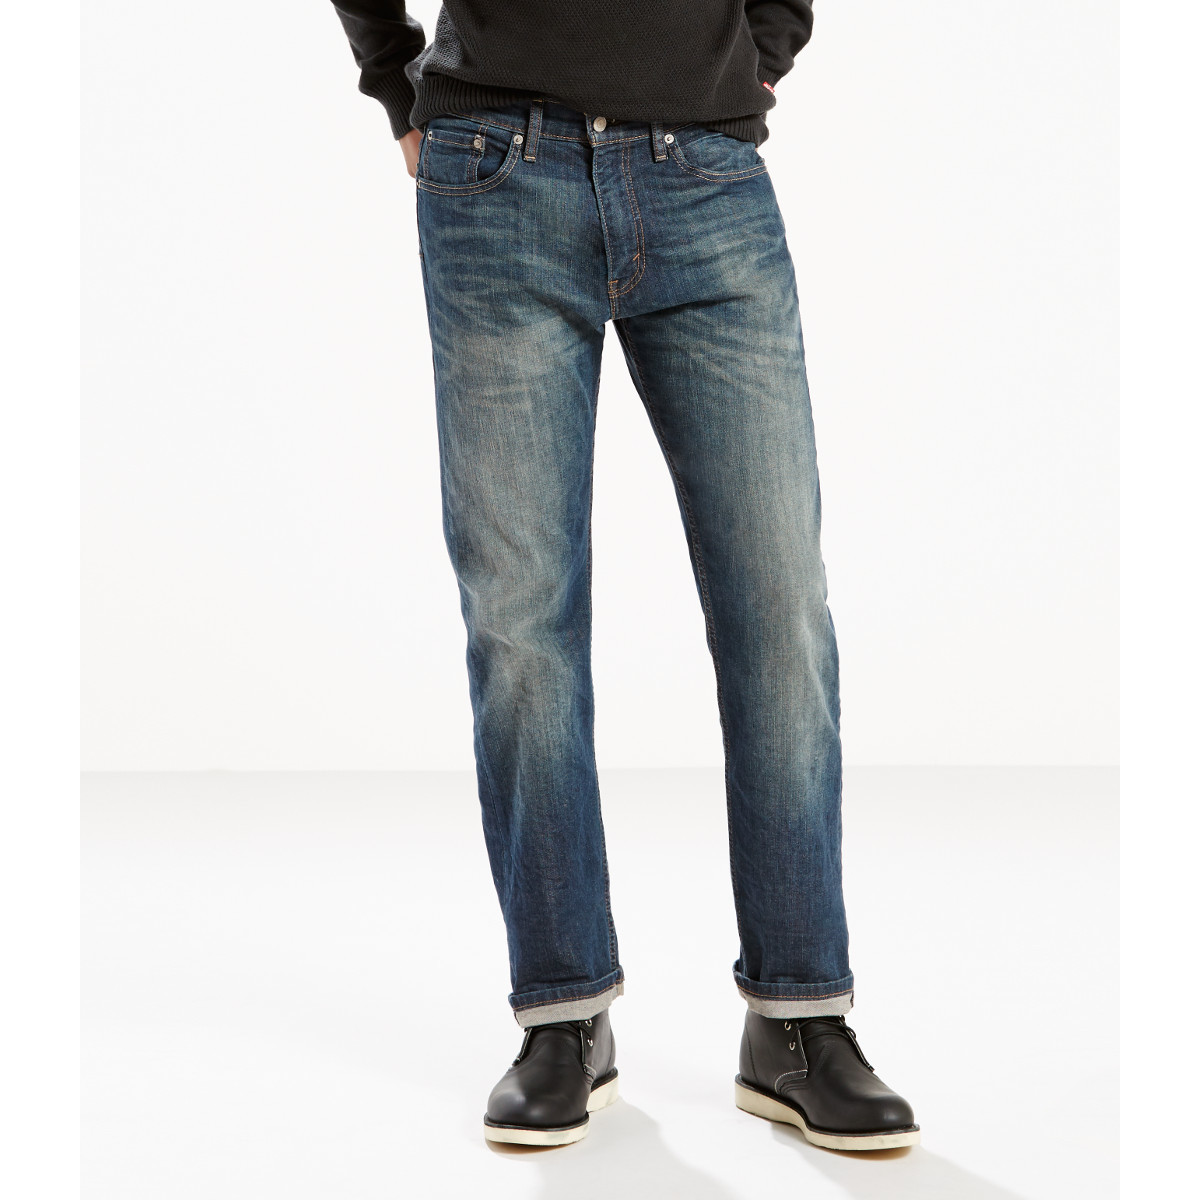 Levi's Men's 505 Regular Fit Jeans - Blue, 35/32